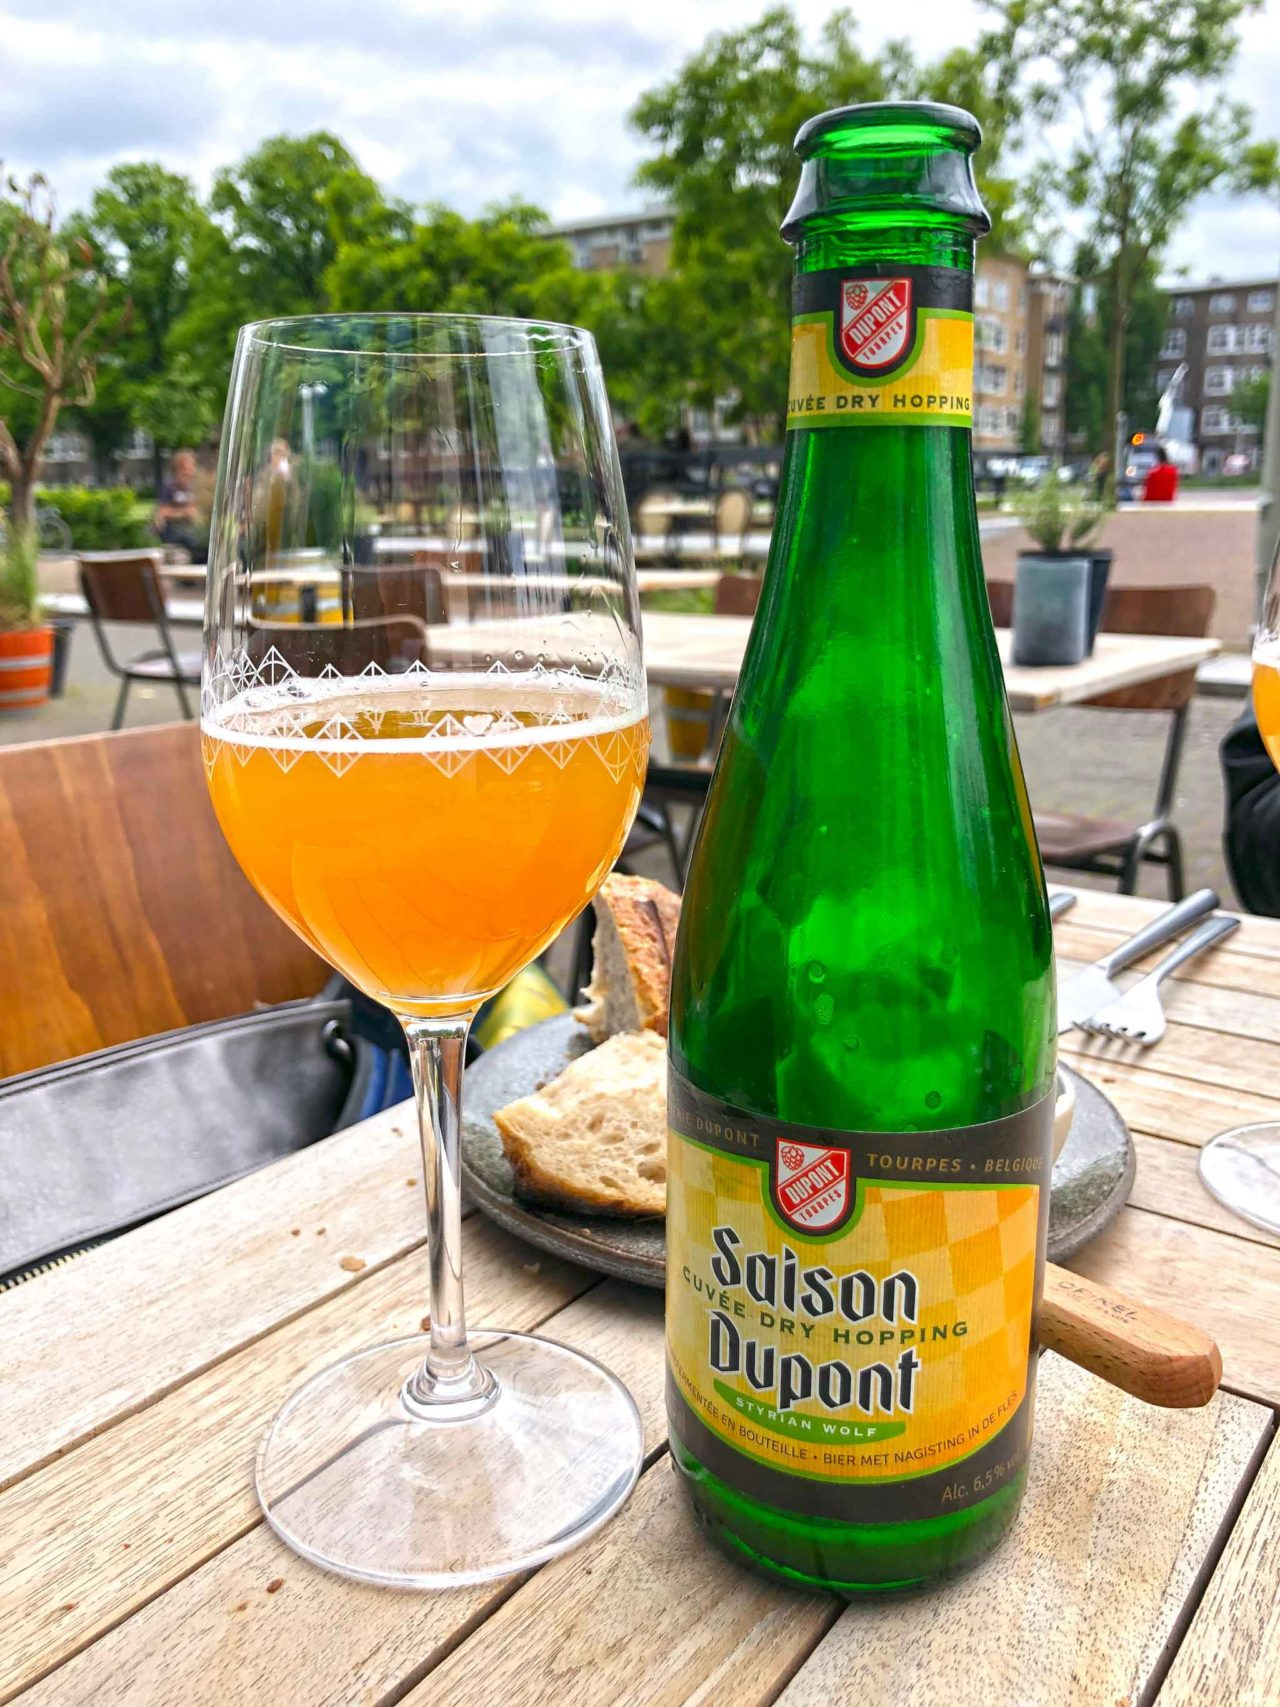 Stili birra saison